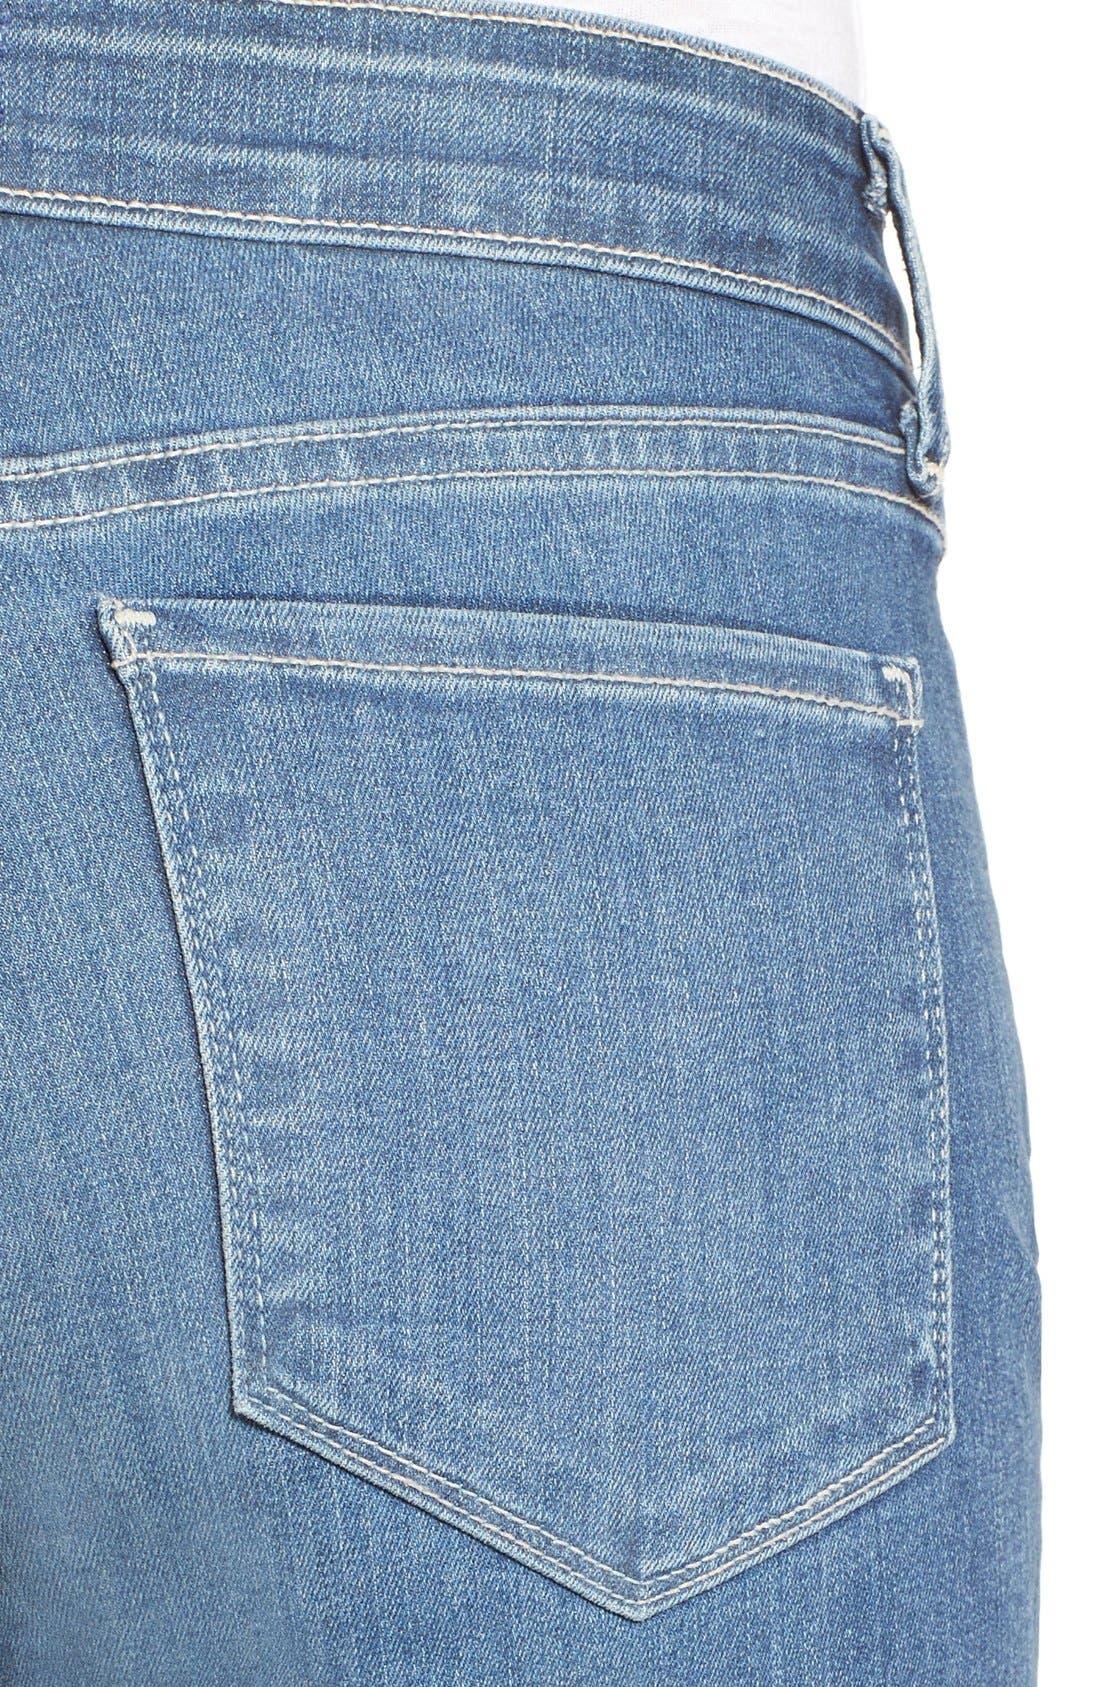 NYDJ, Marilyn Stretch Straight Leg Jeans, Alternate thumbnail 6, color, HEYBURN